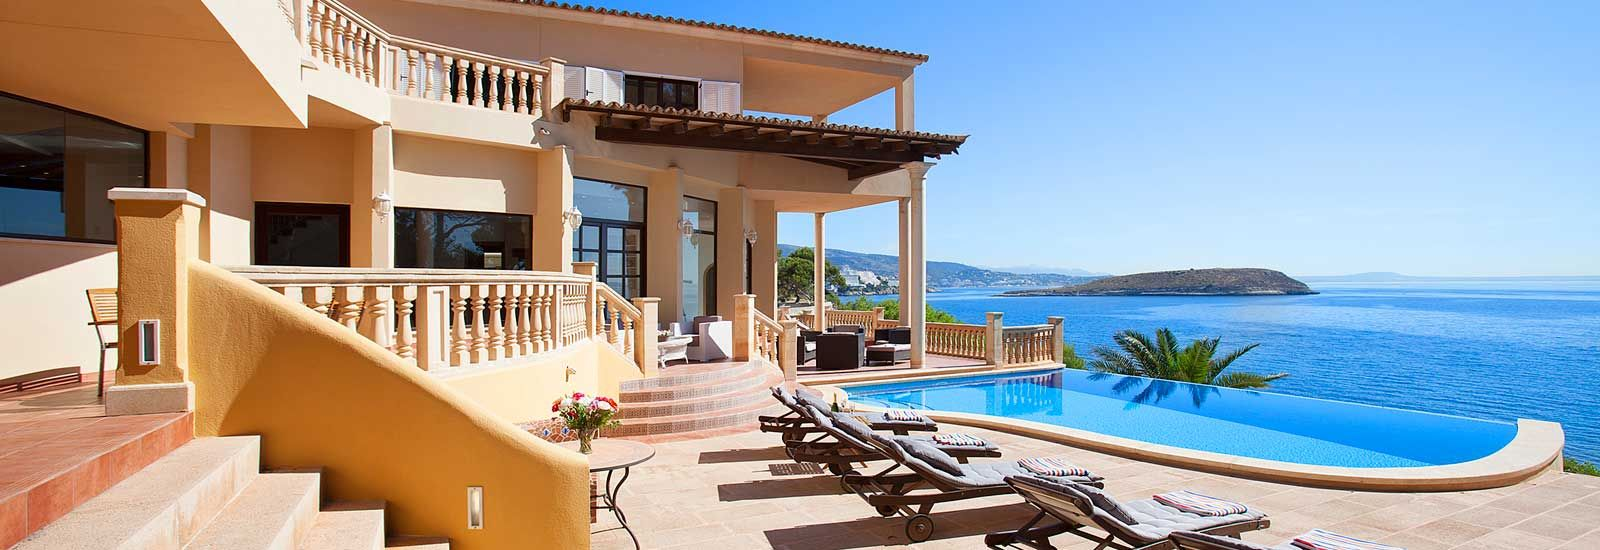 Ferienhaus Mallorca Kaufen Preis House Styles Mansions Outdoor Decor